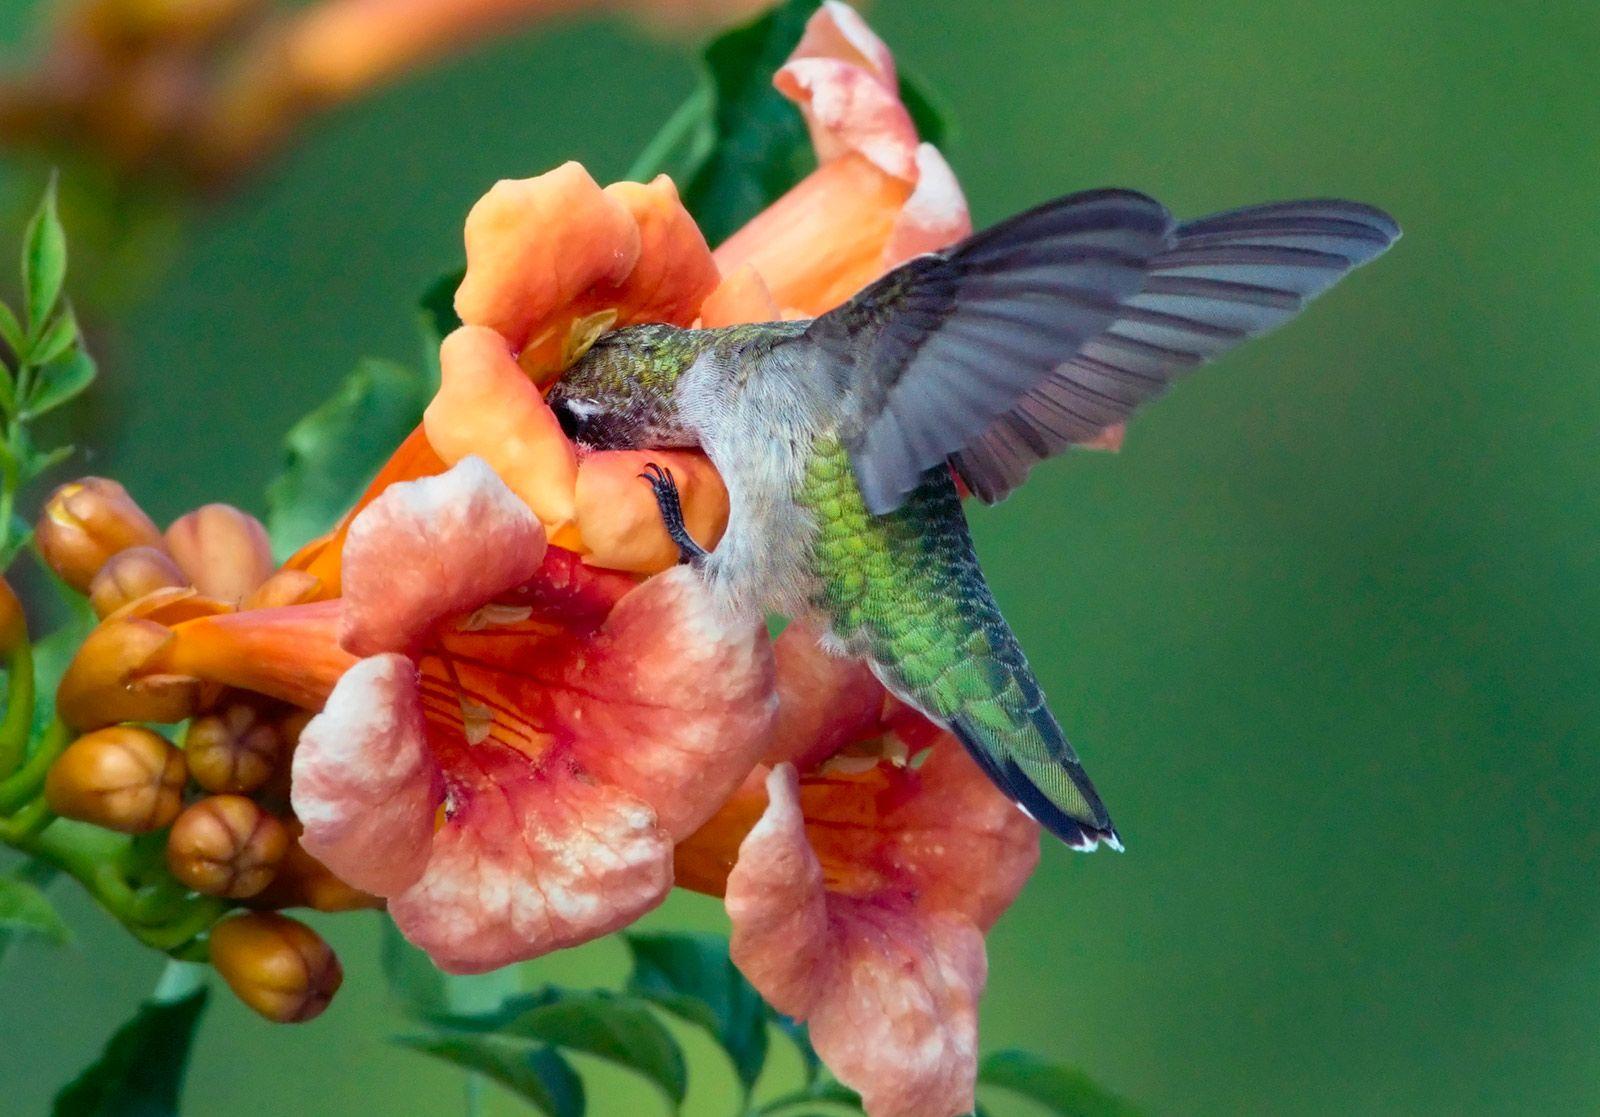 photo of Ruby throated hummingbird. Backyard birds, How